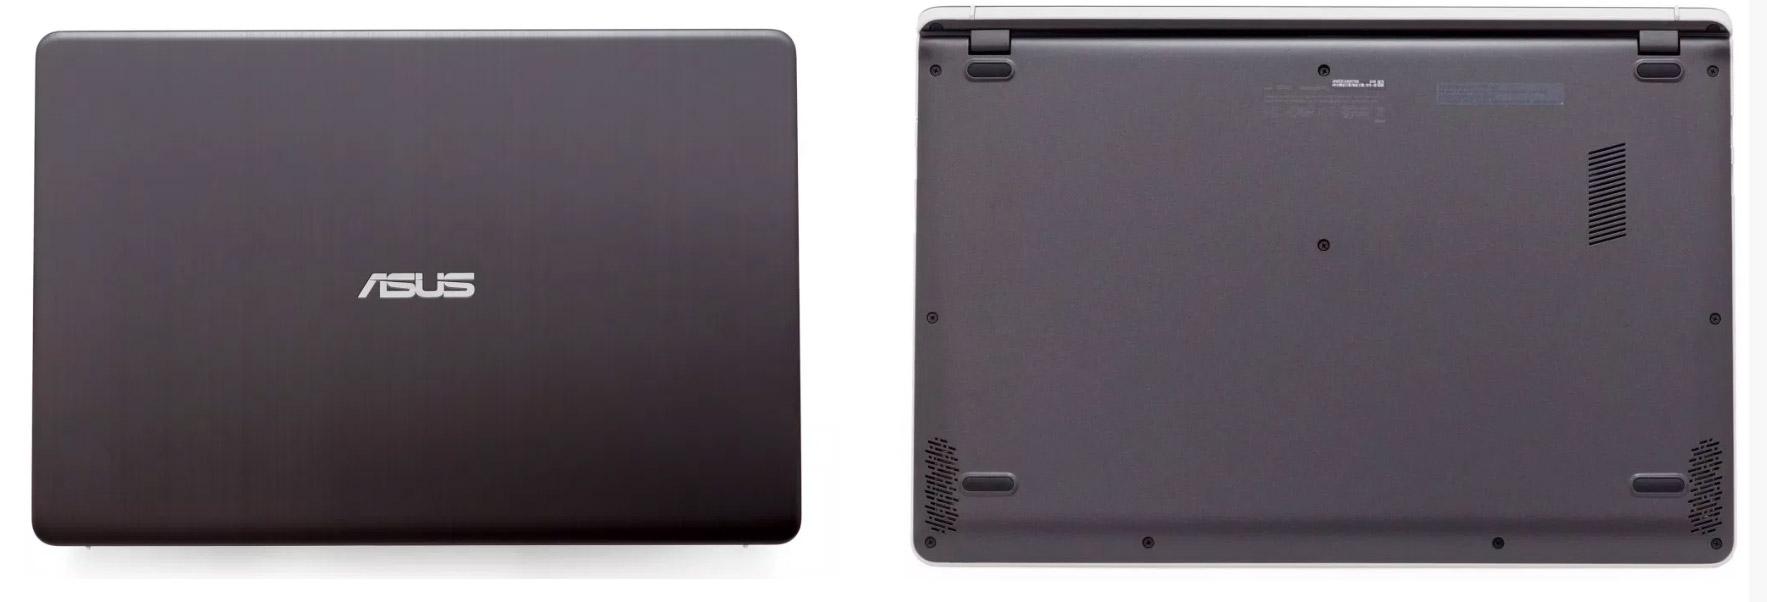 ASUS 华硕 灵耀S 2代(S5300UN) 评测